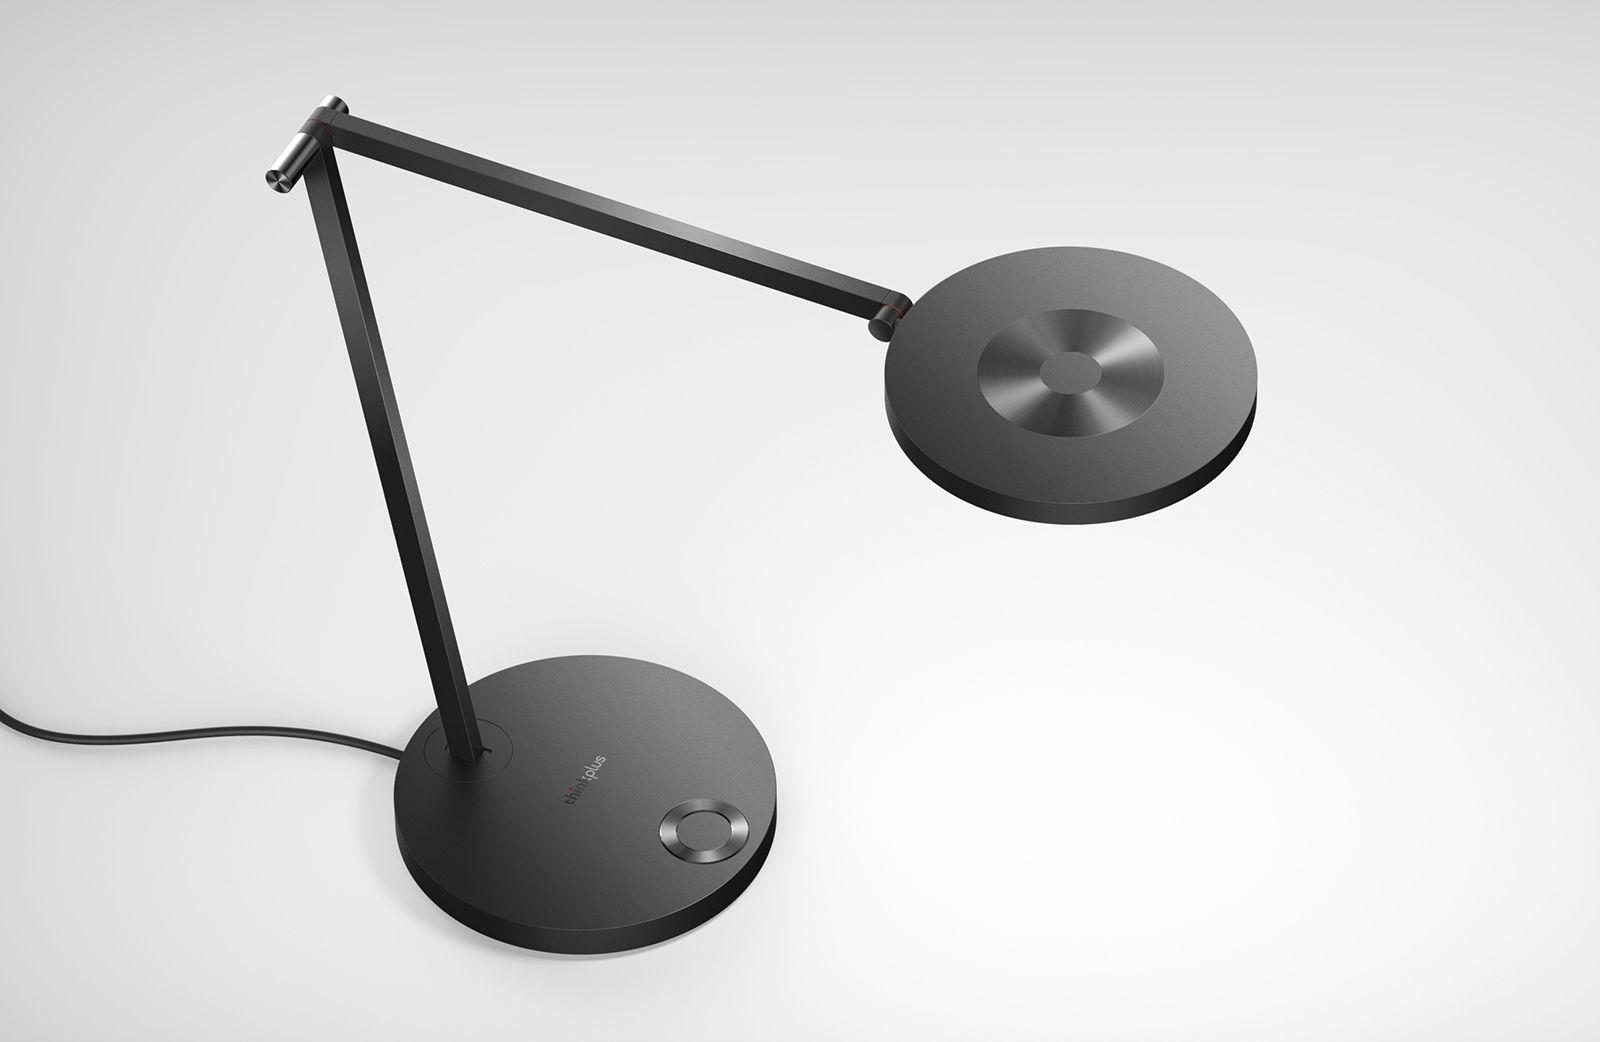 Thinkplus Desk Lamp